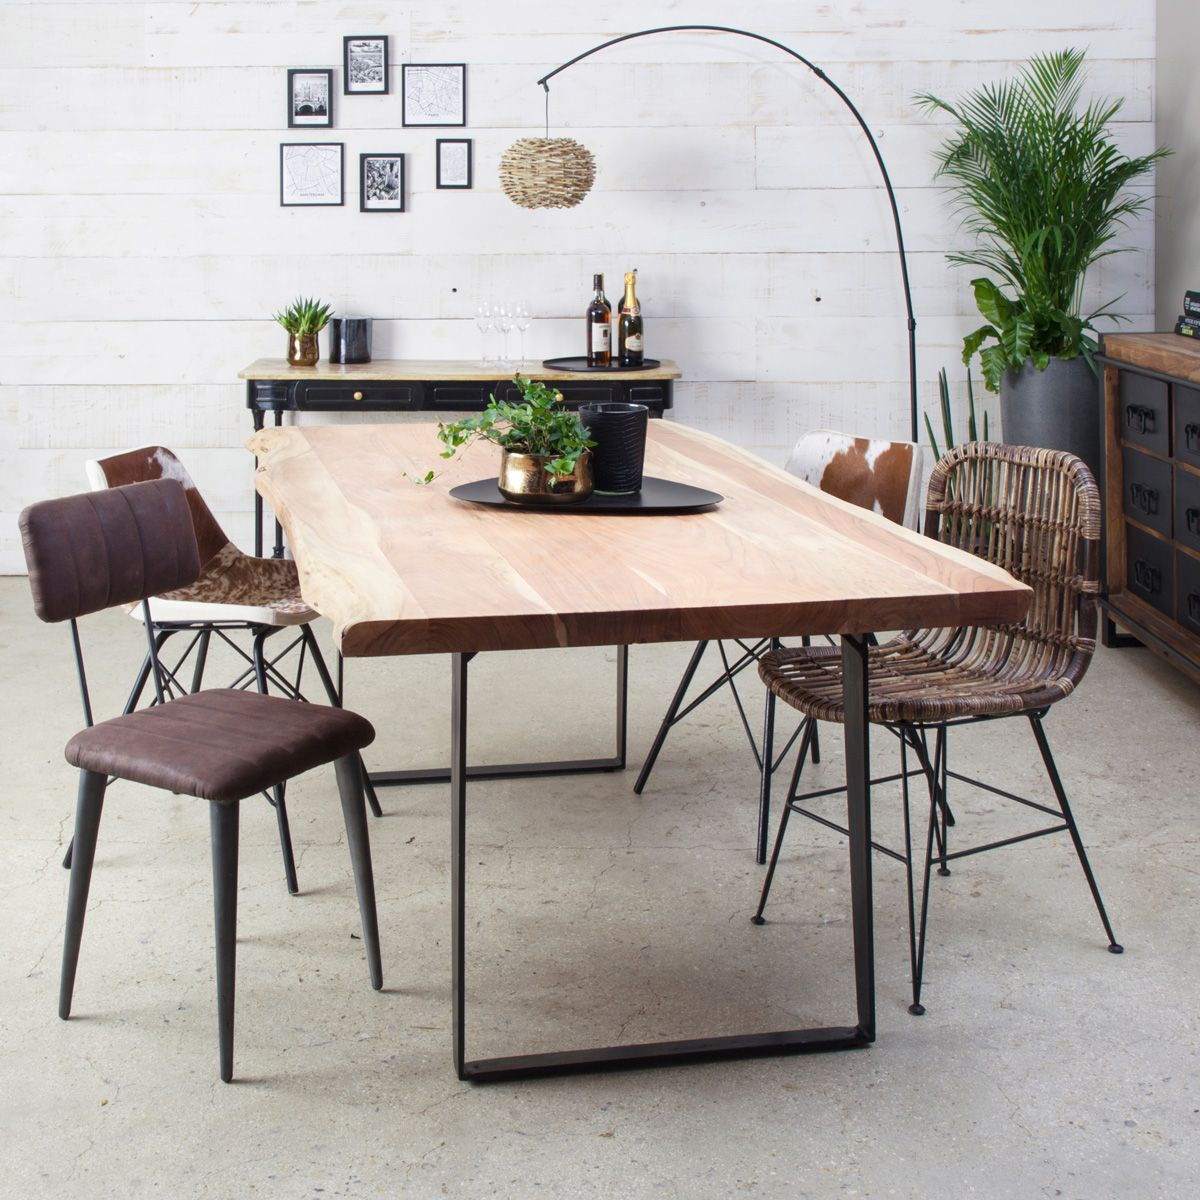 Table A Manger Bois Massif Tronc D Arbre Pieds Metal Table A Manger Chaise Style Industriel Table Salle A Manger